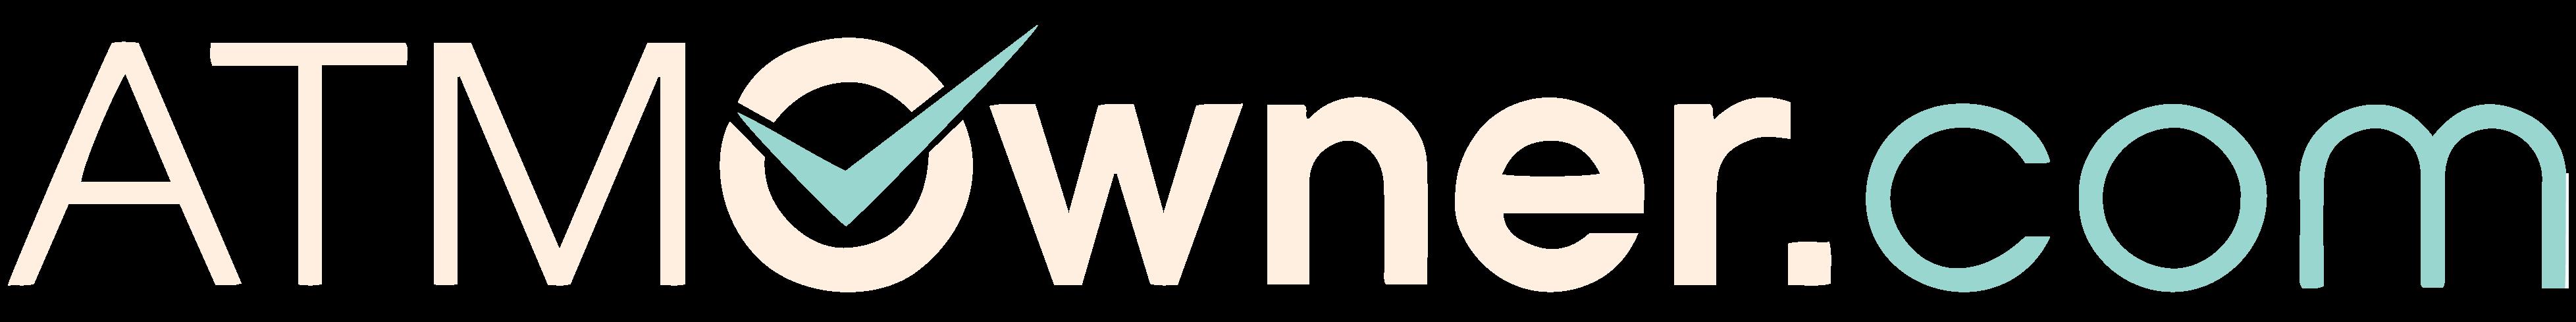 ATMOwner.com